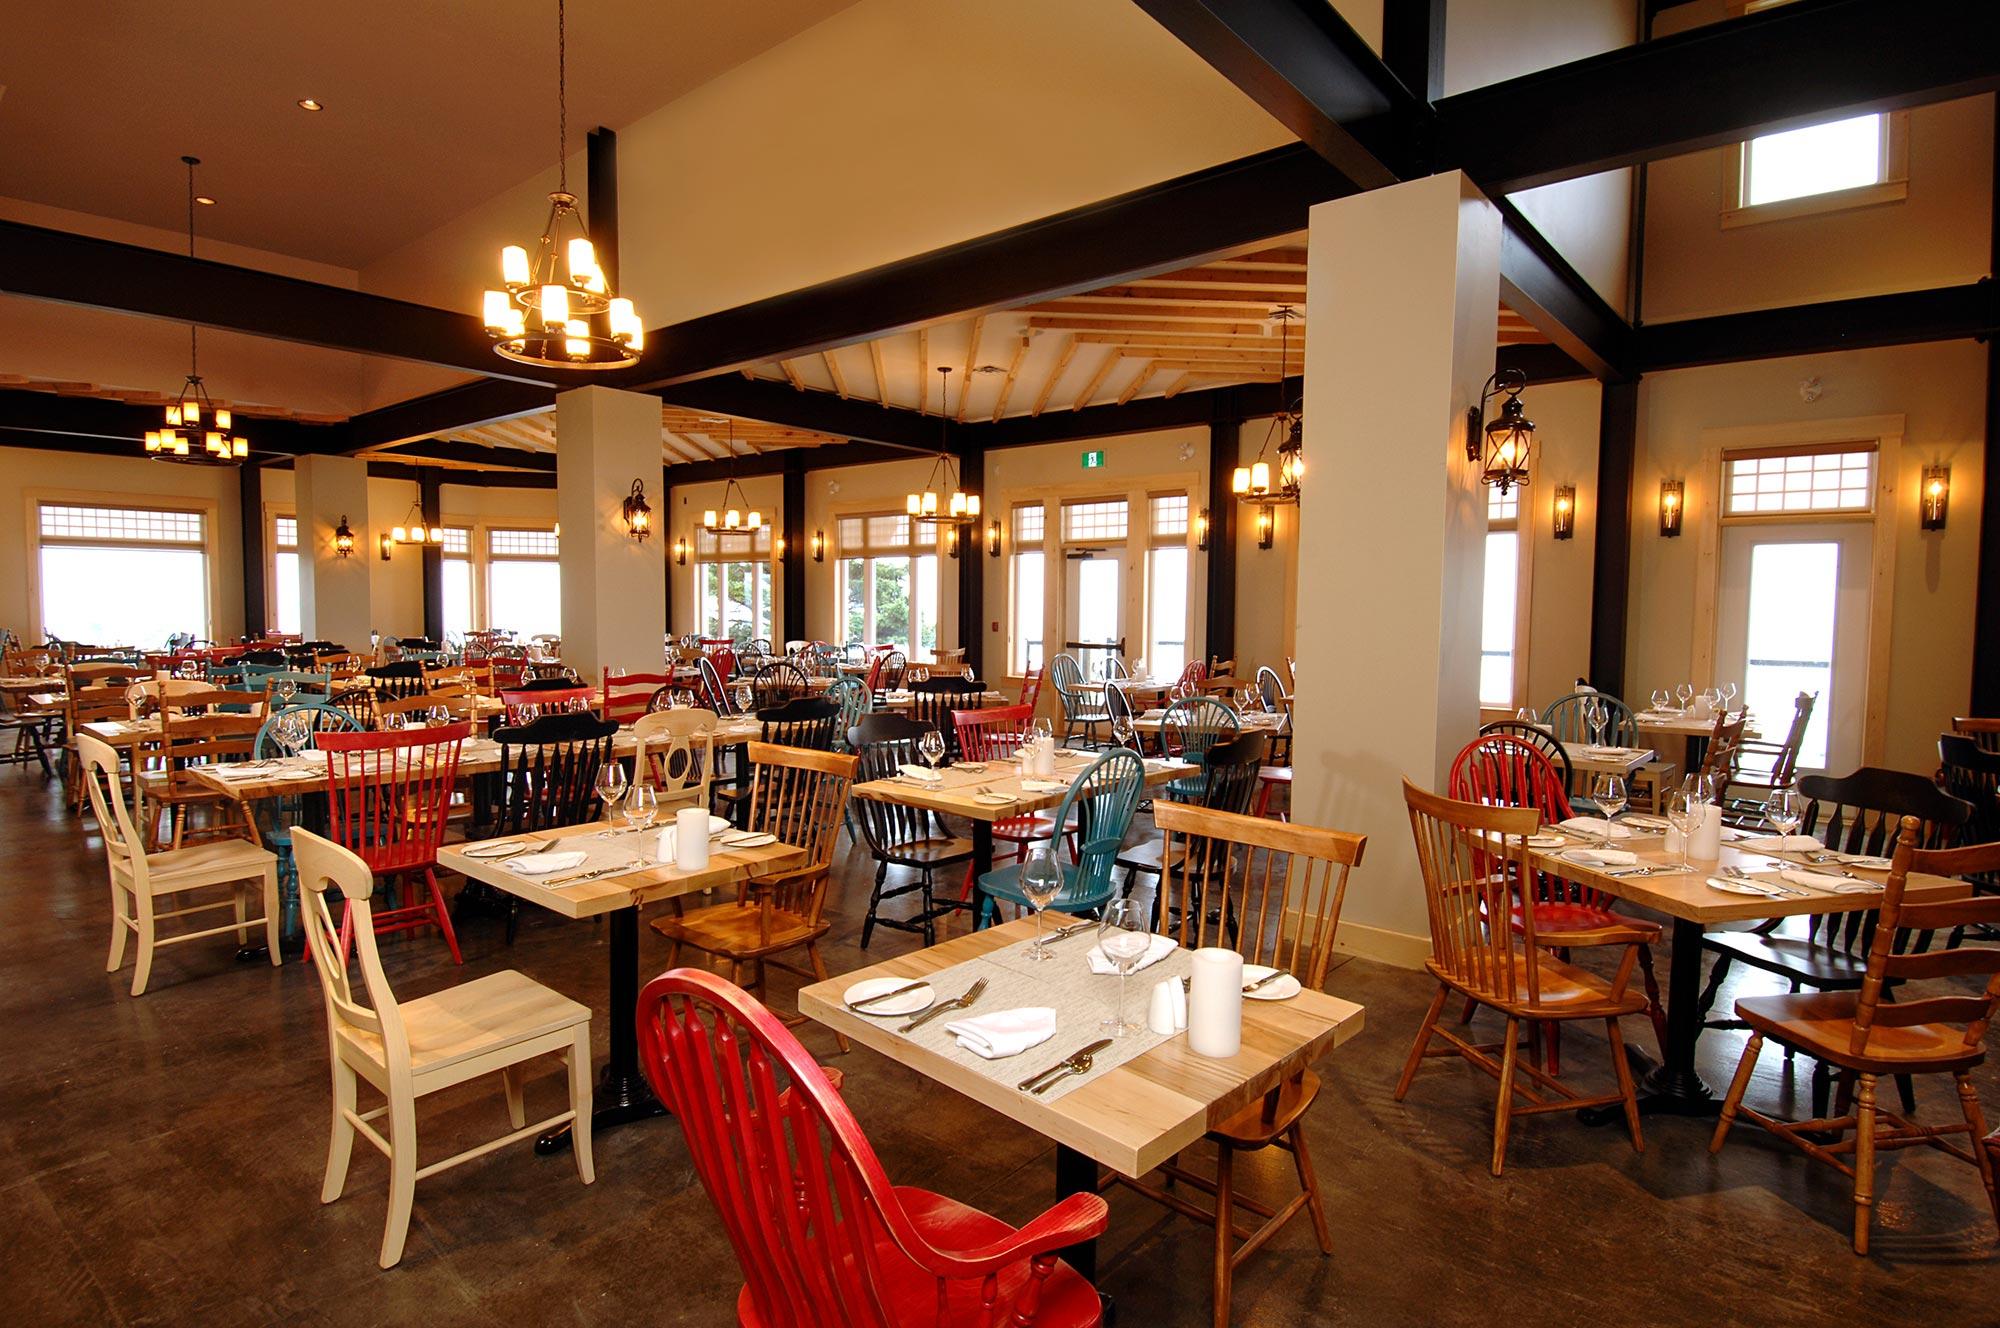 interior-design-restuarant-nova-scotia-dining.jpg